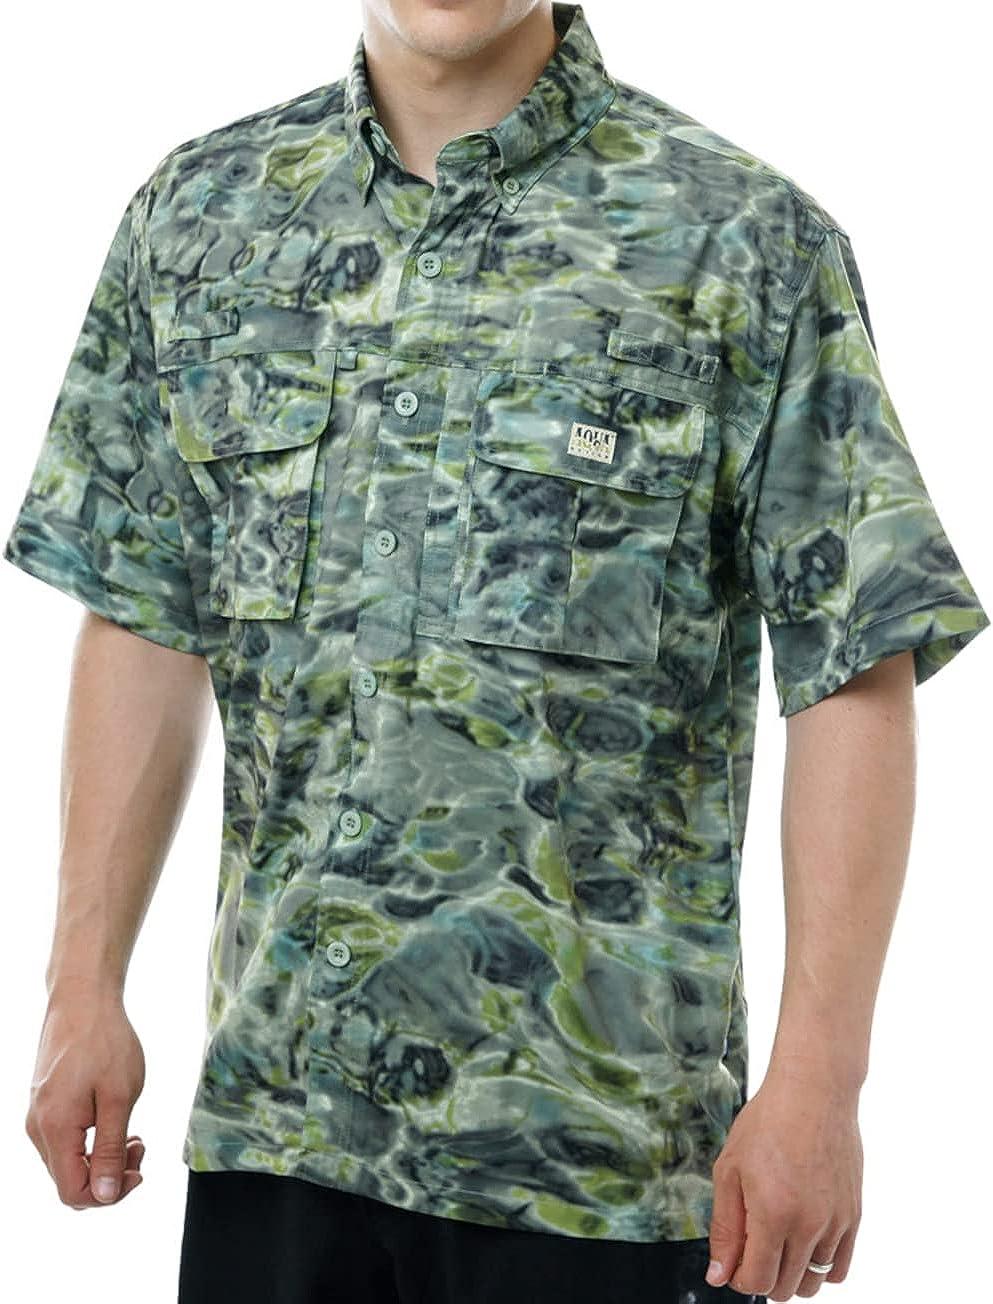 Aqua Manufacturer regenerated product Design: Fly Fishing Mens Shirts Brand Cheap Sale Venue Sleeve UPF Fl 50+ Men Short